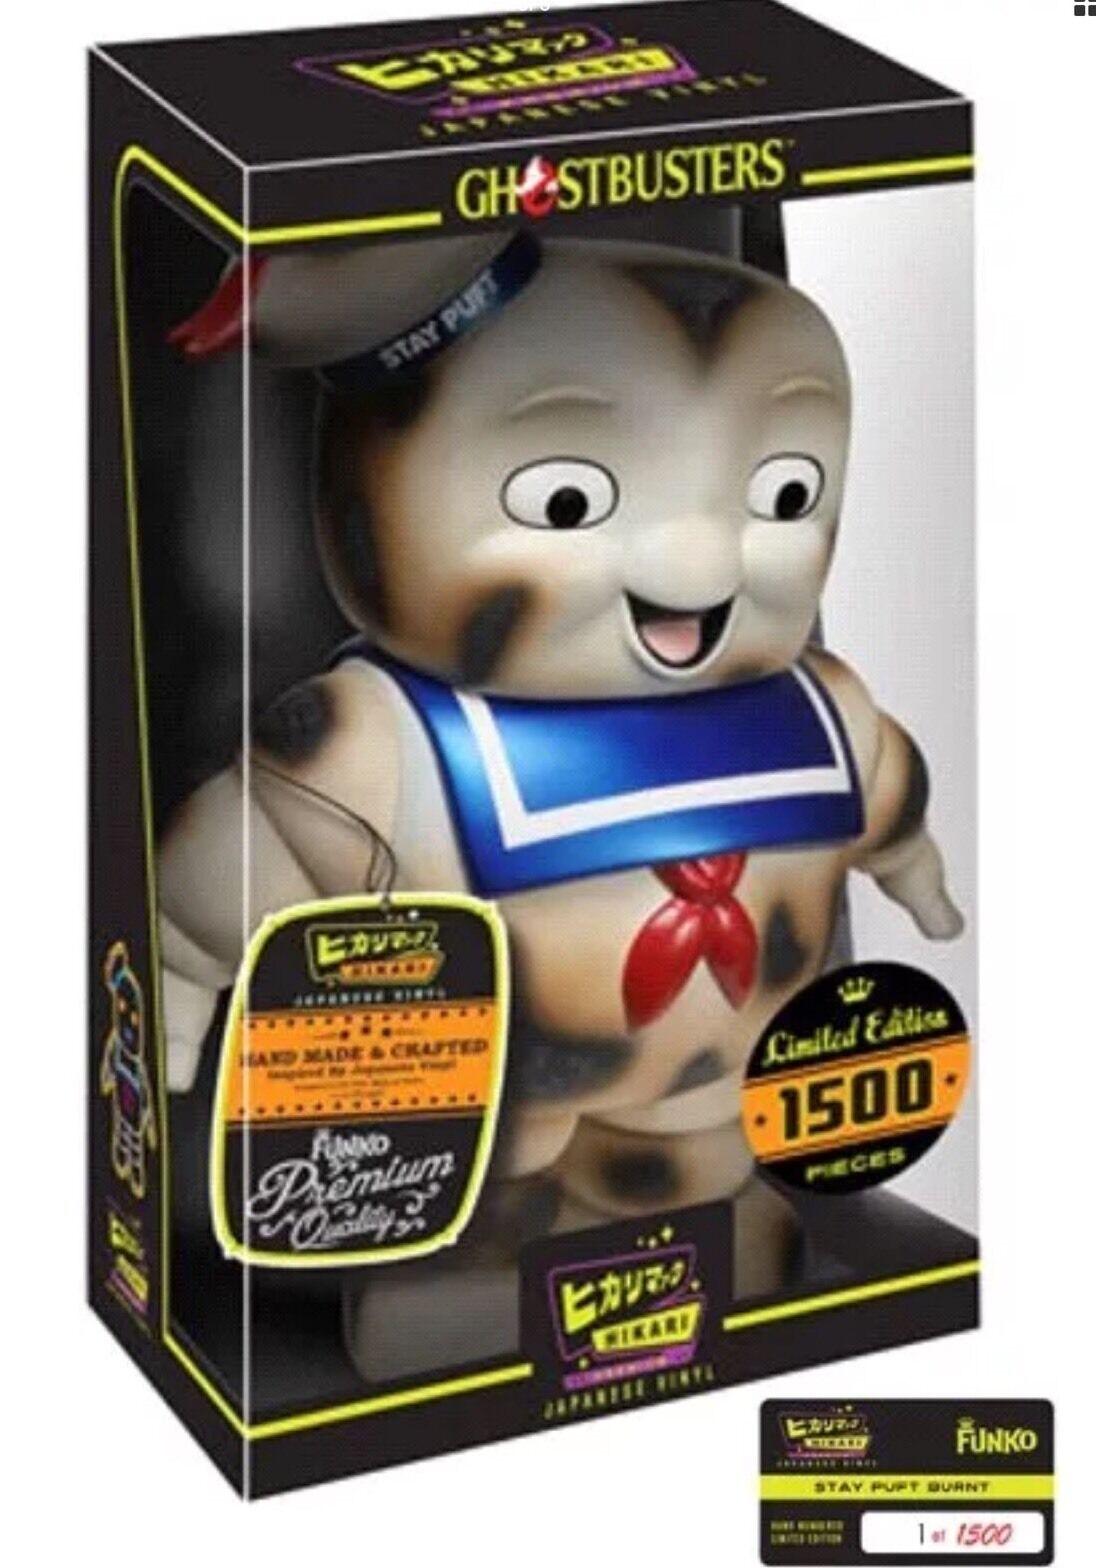 Ghostbusters FUNKO HIKARI BURNT STAY PUFT Limited Edition 1500 COA PREMIUM GIFT